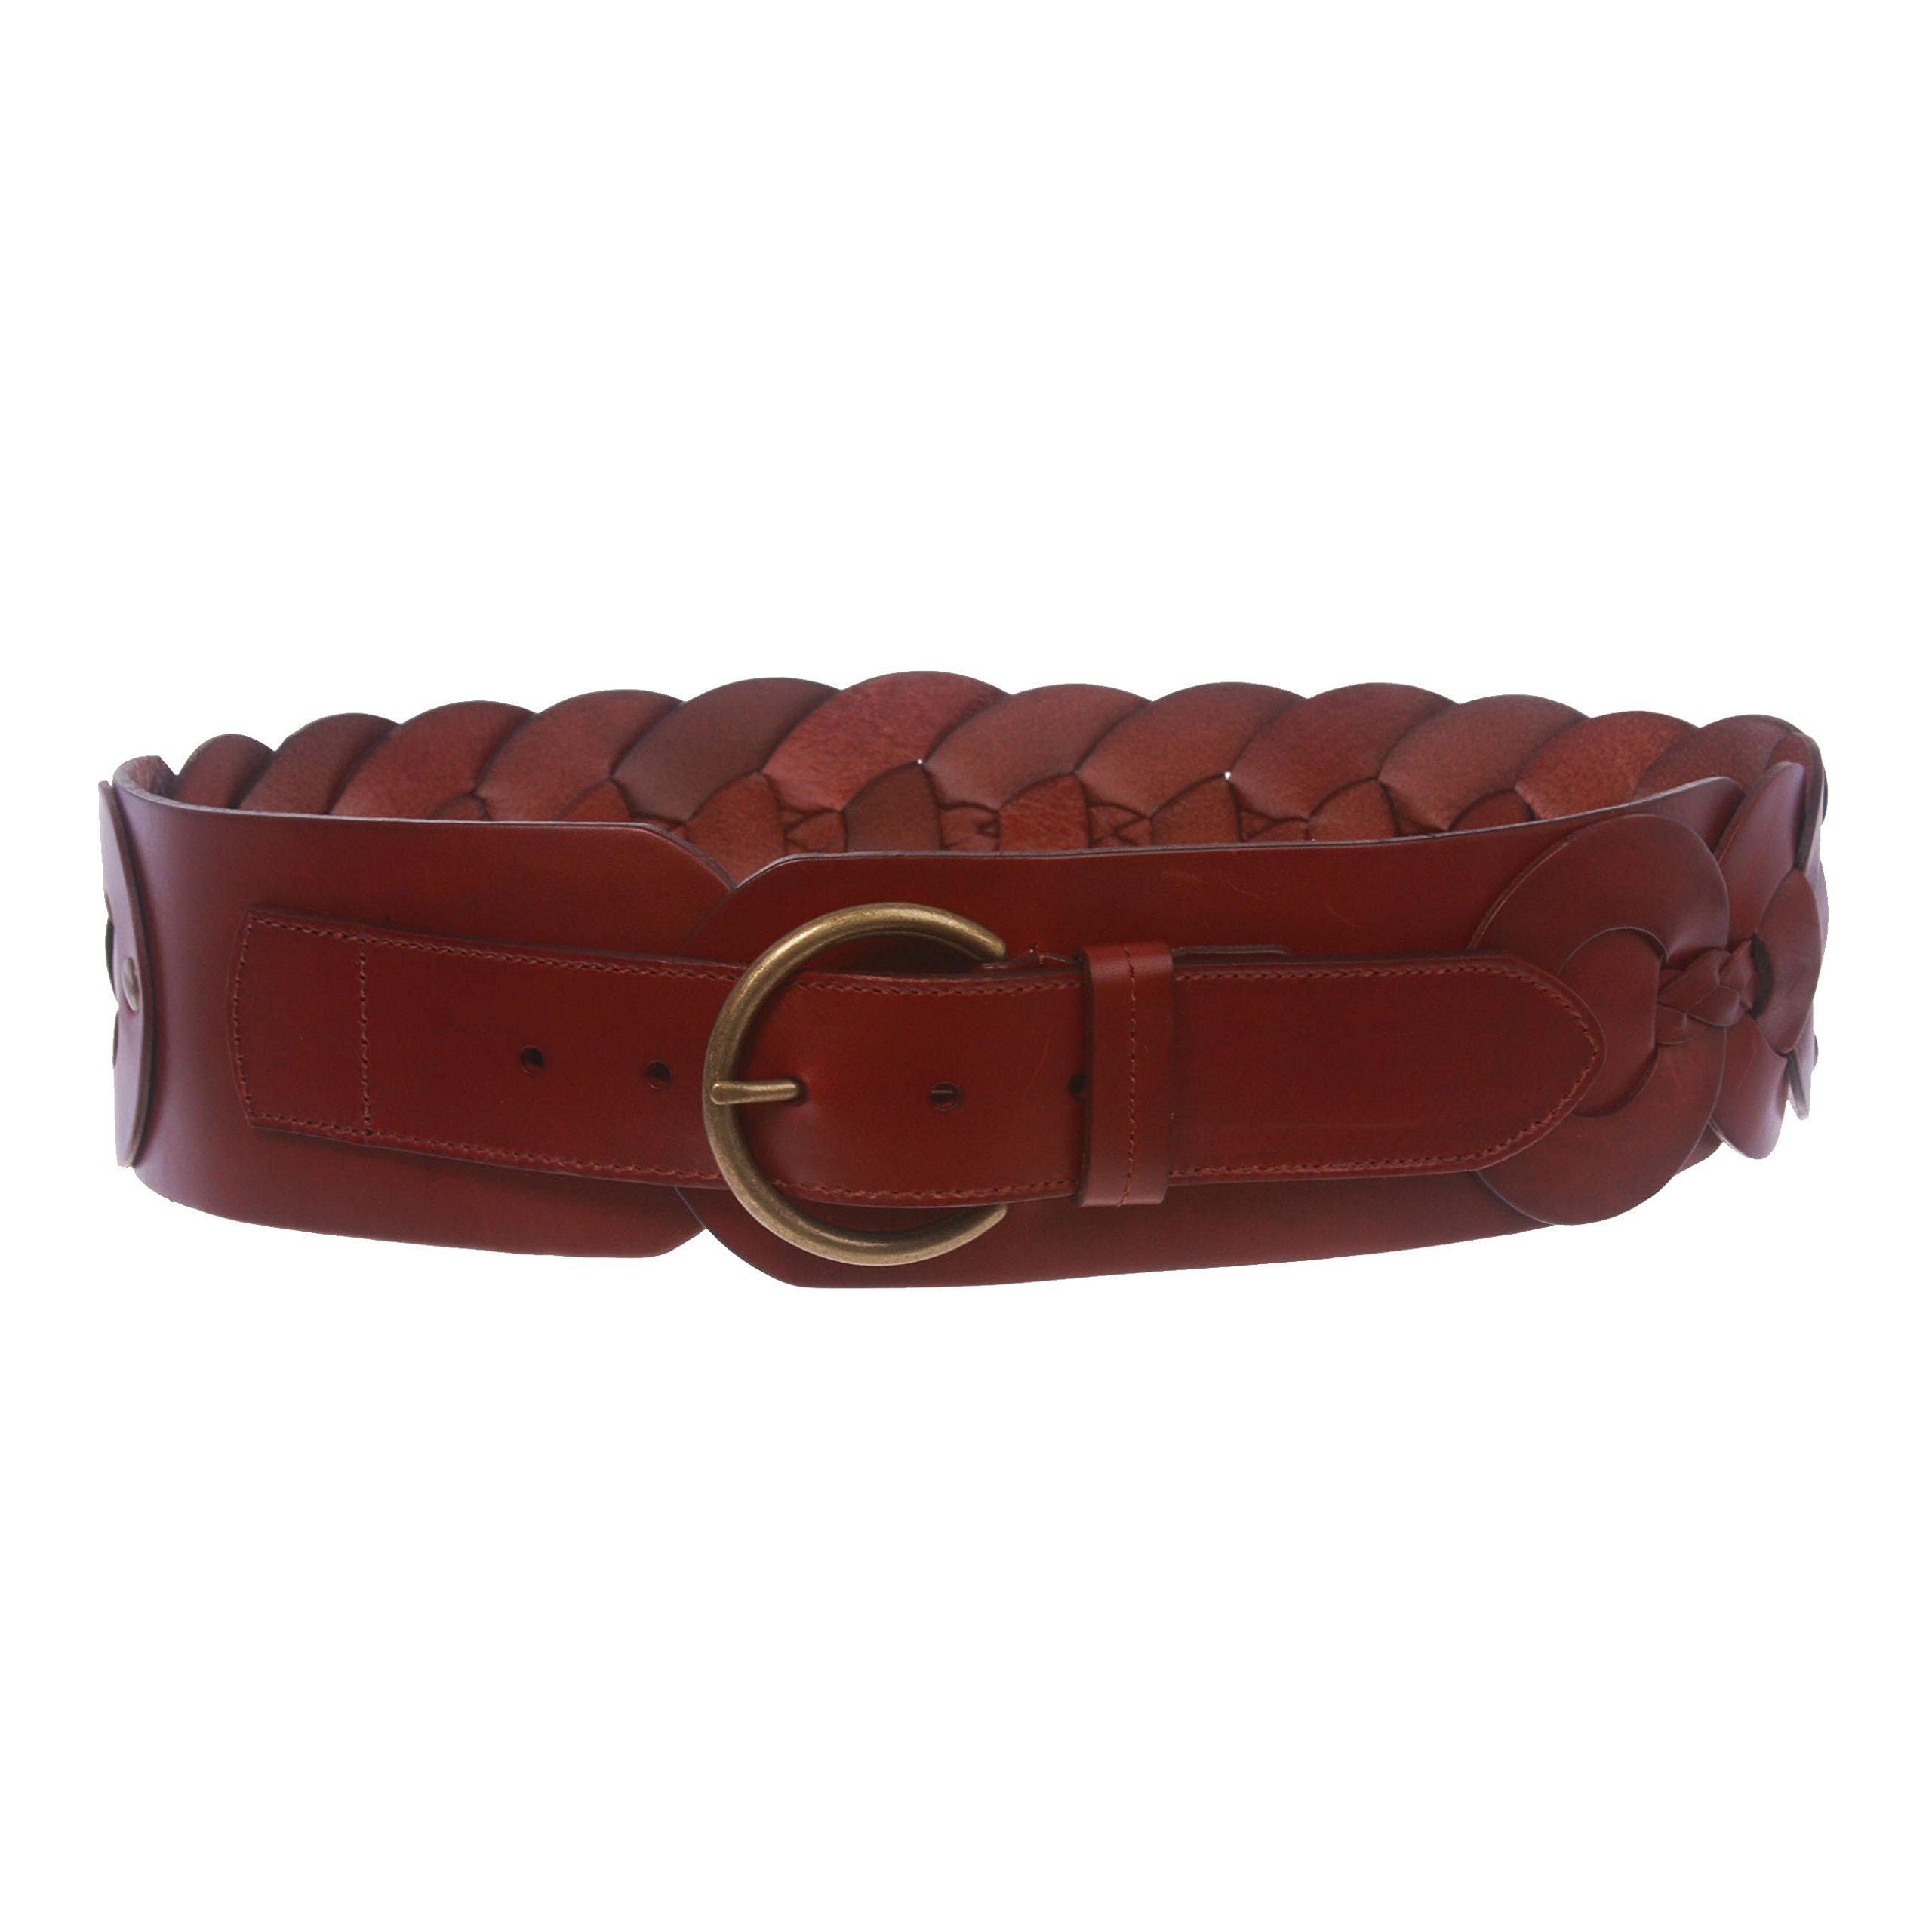 Ladies 3'' (75 mm) Wide High Waist Round Disk Linked Braided Cowhide Top Full Grain Leather Belt, Wine | S - 34